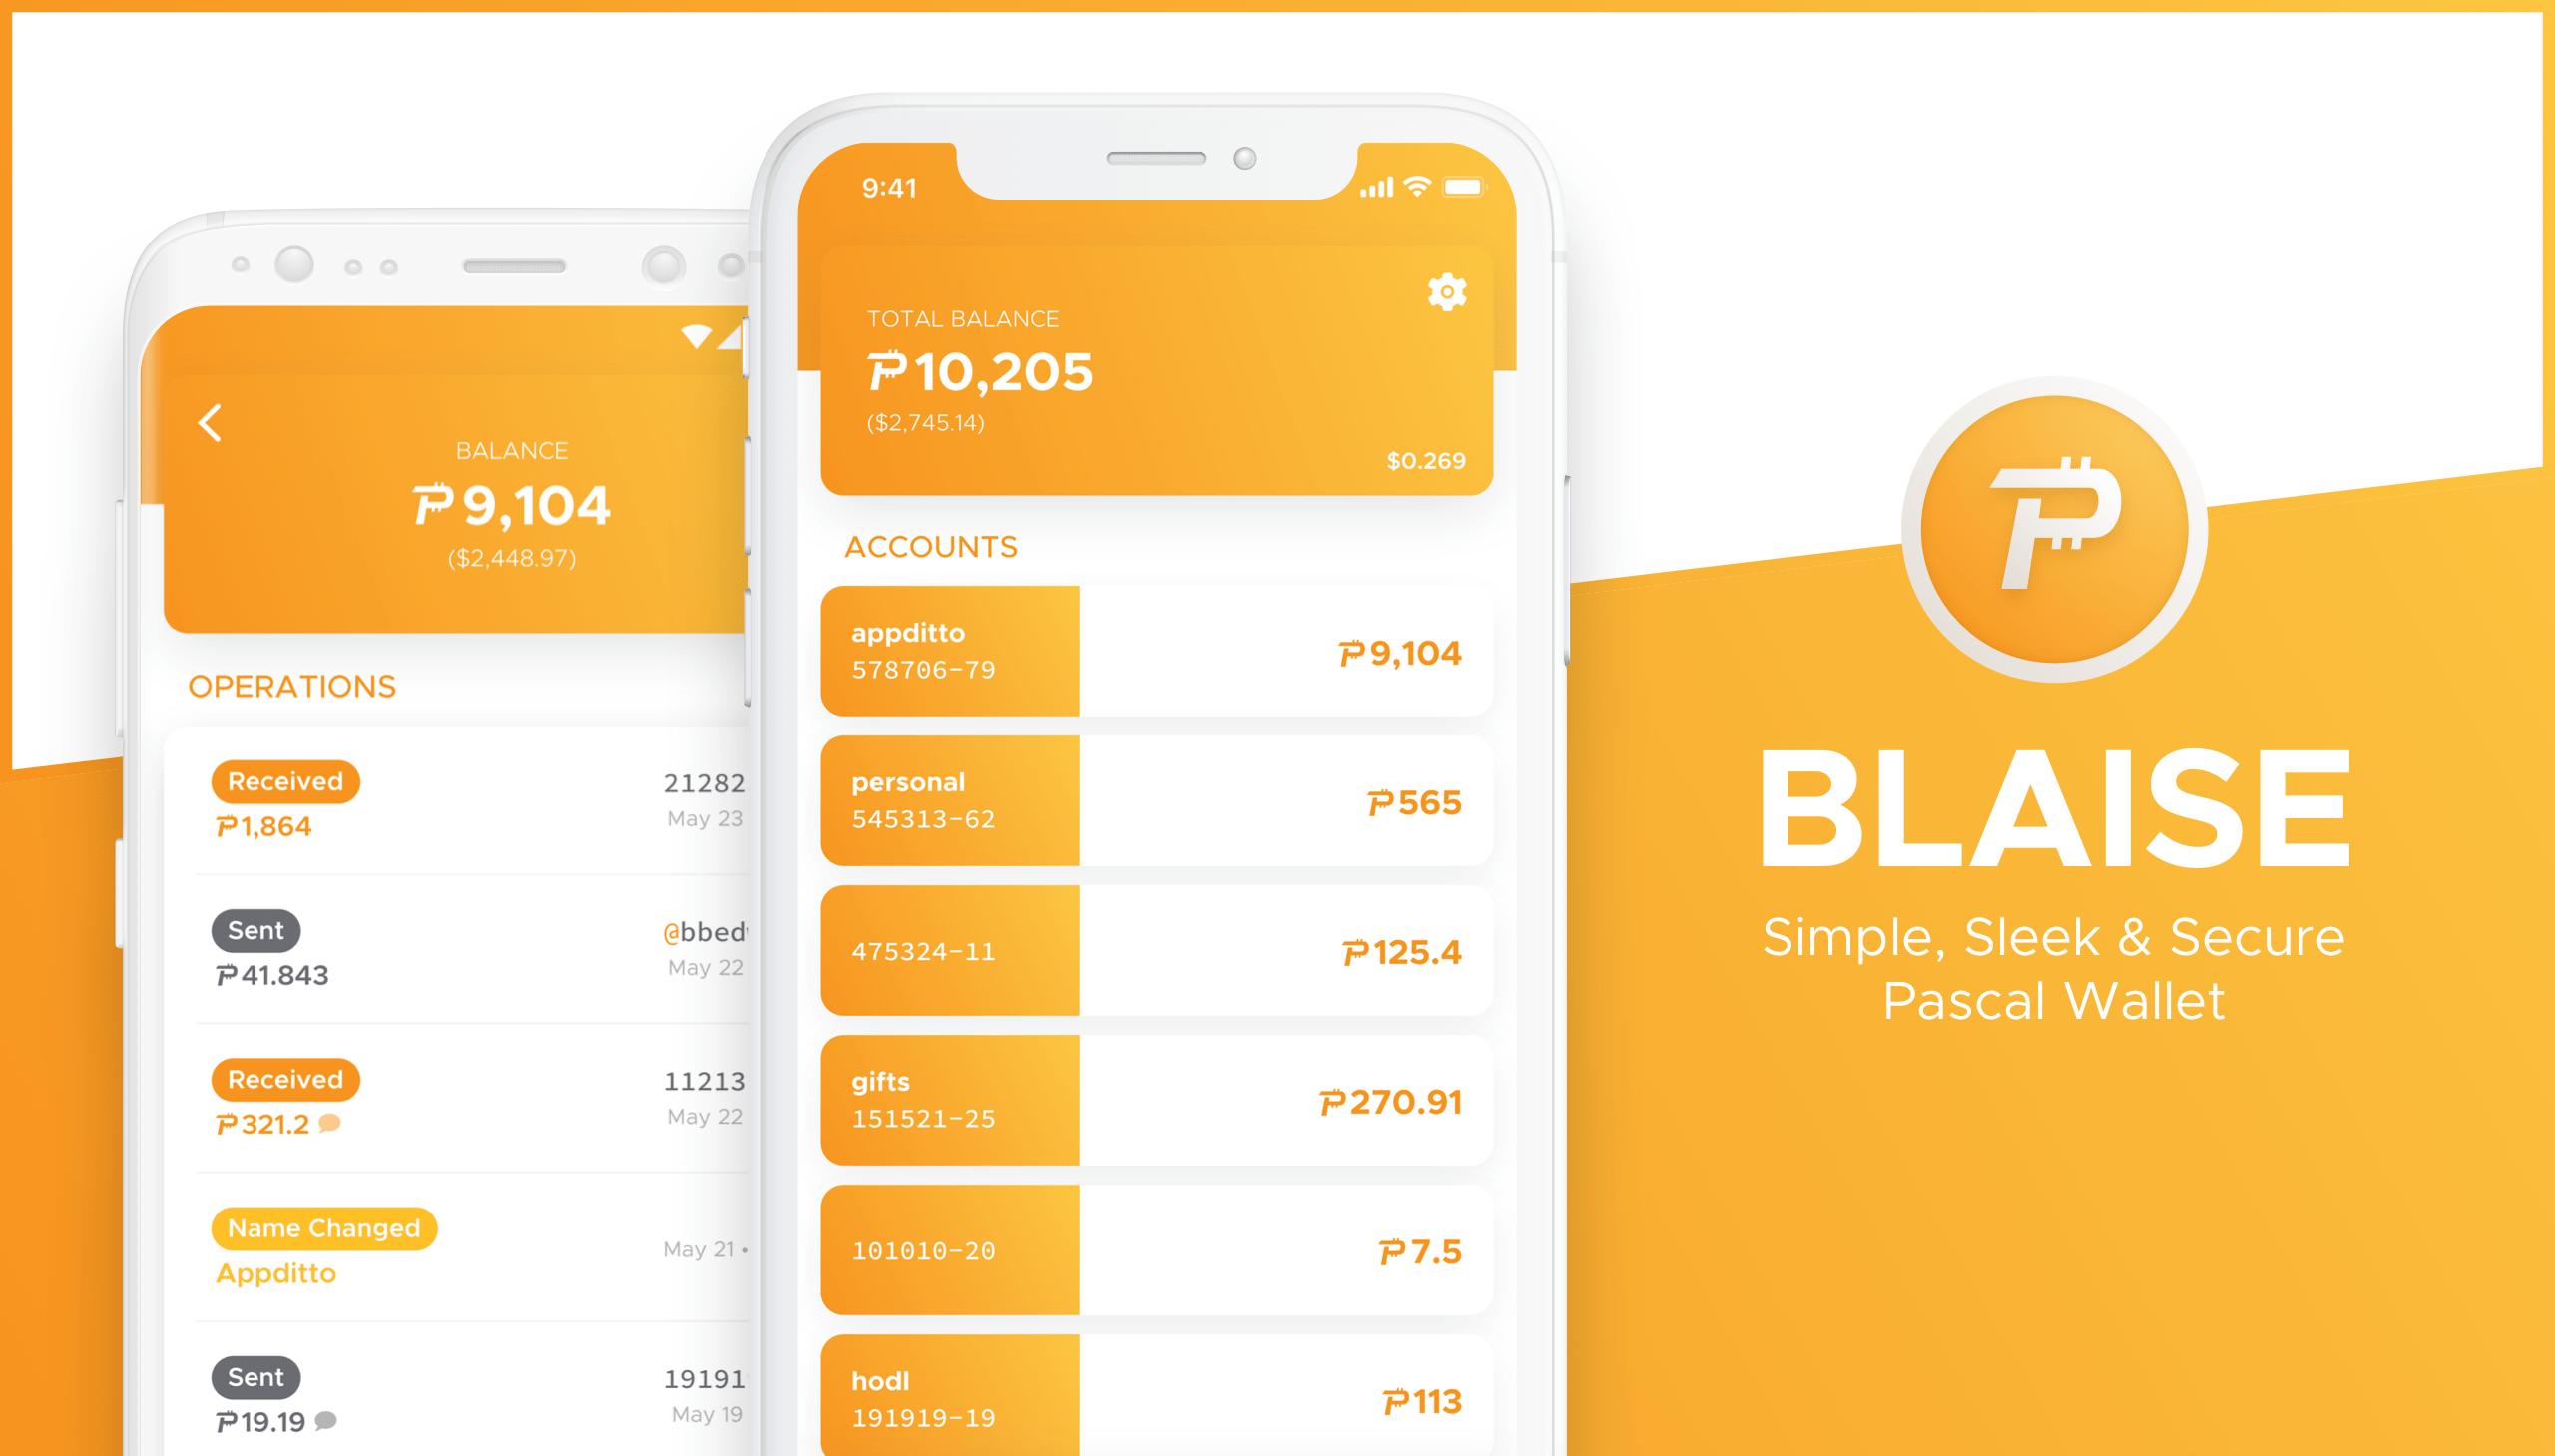 Blaise is a simple, sleek & secure Pascal wallet